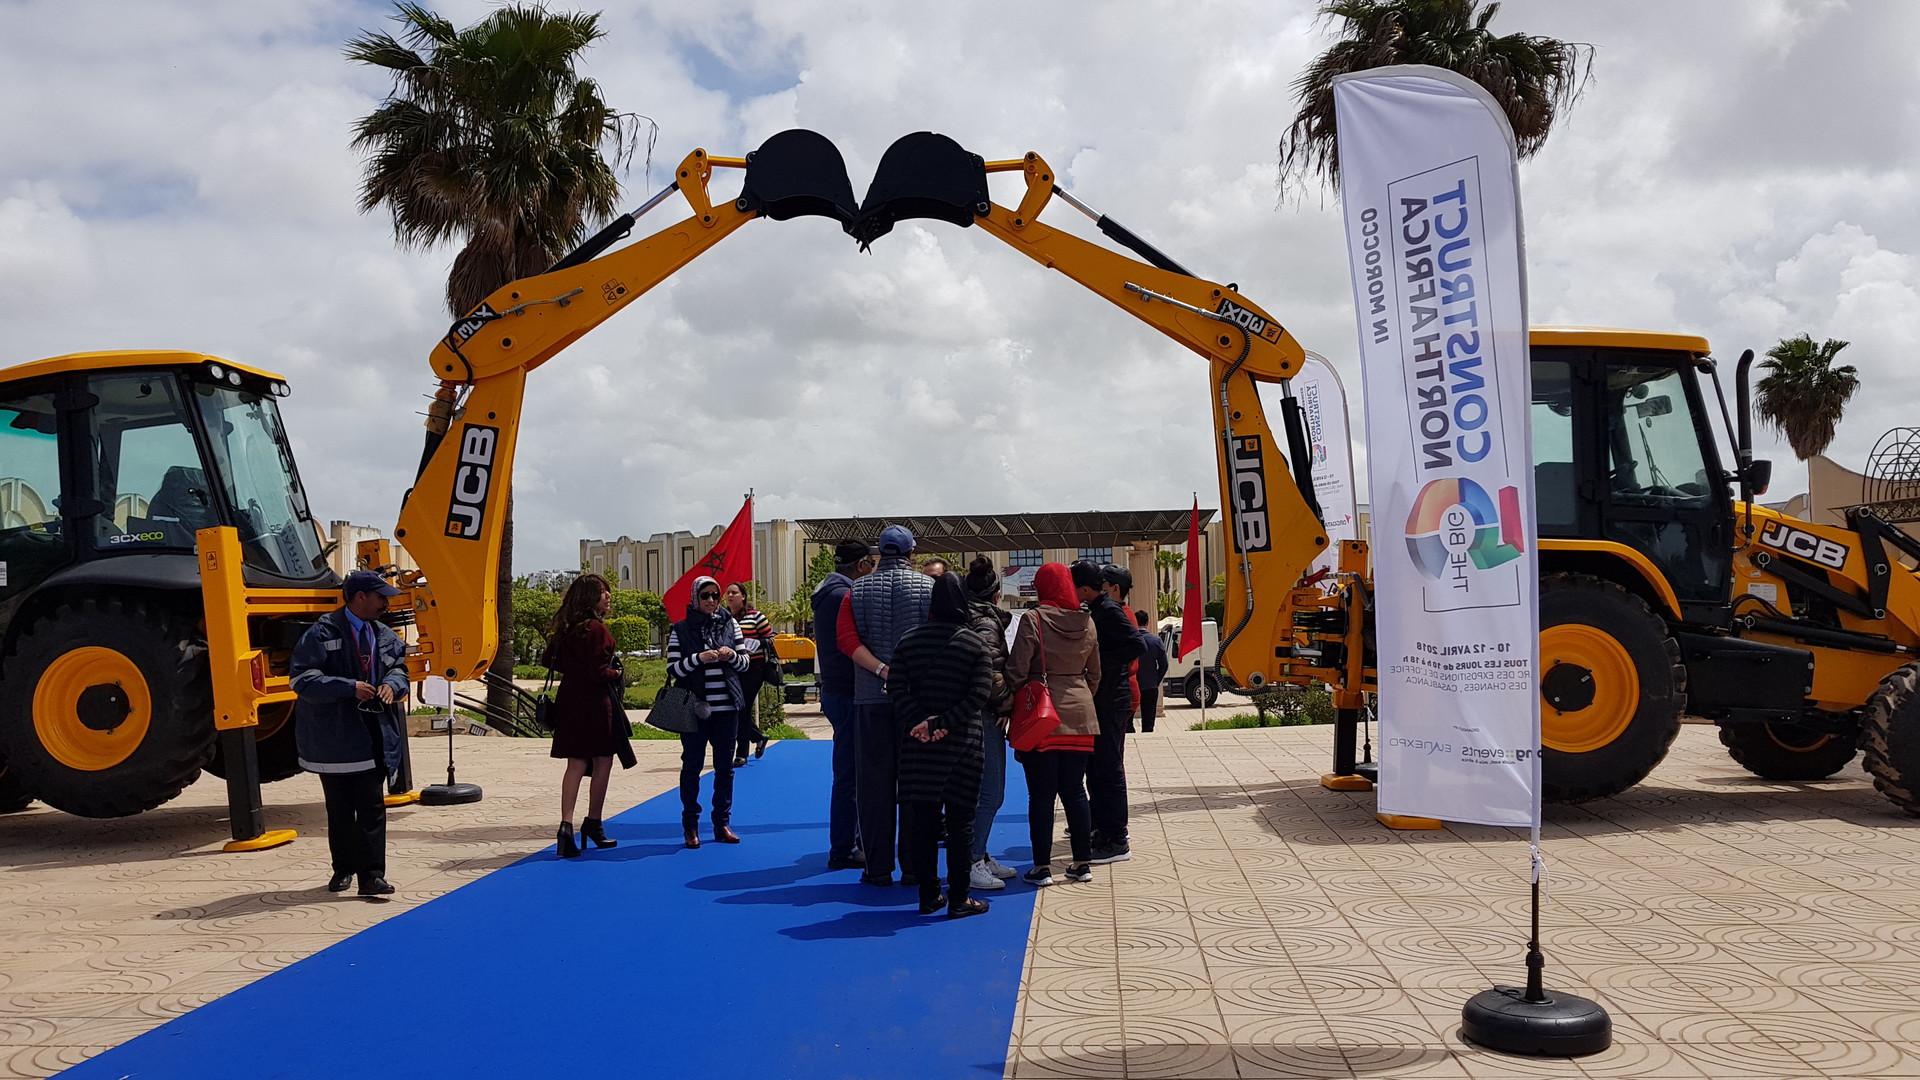 Amedee Santalo vip speaker big5 Construction North Africa 2018